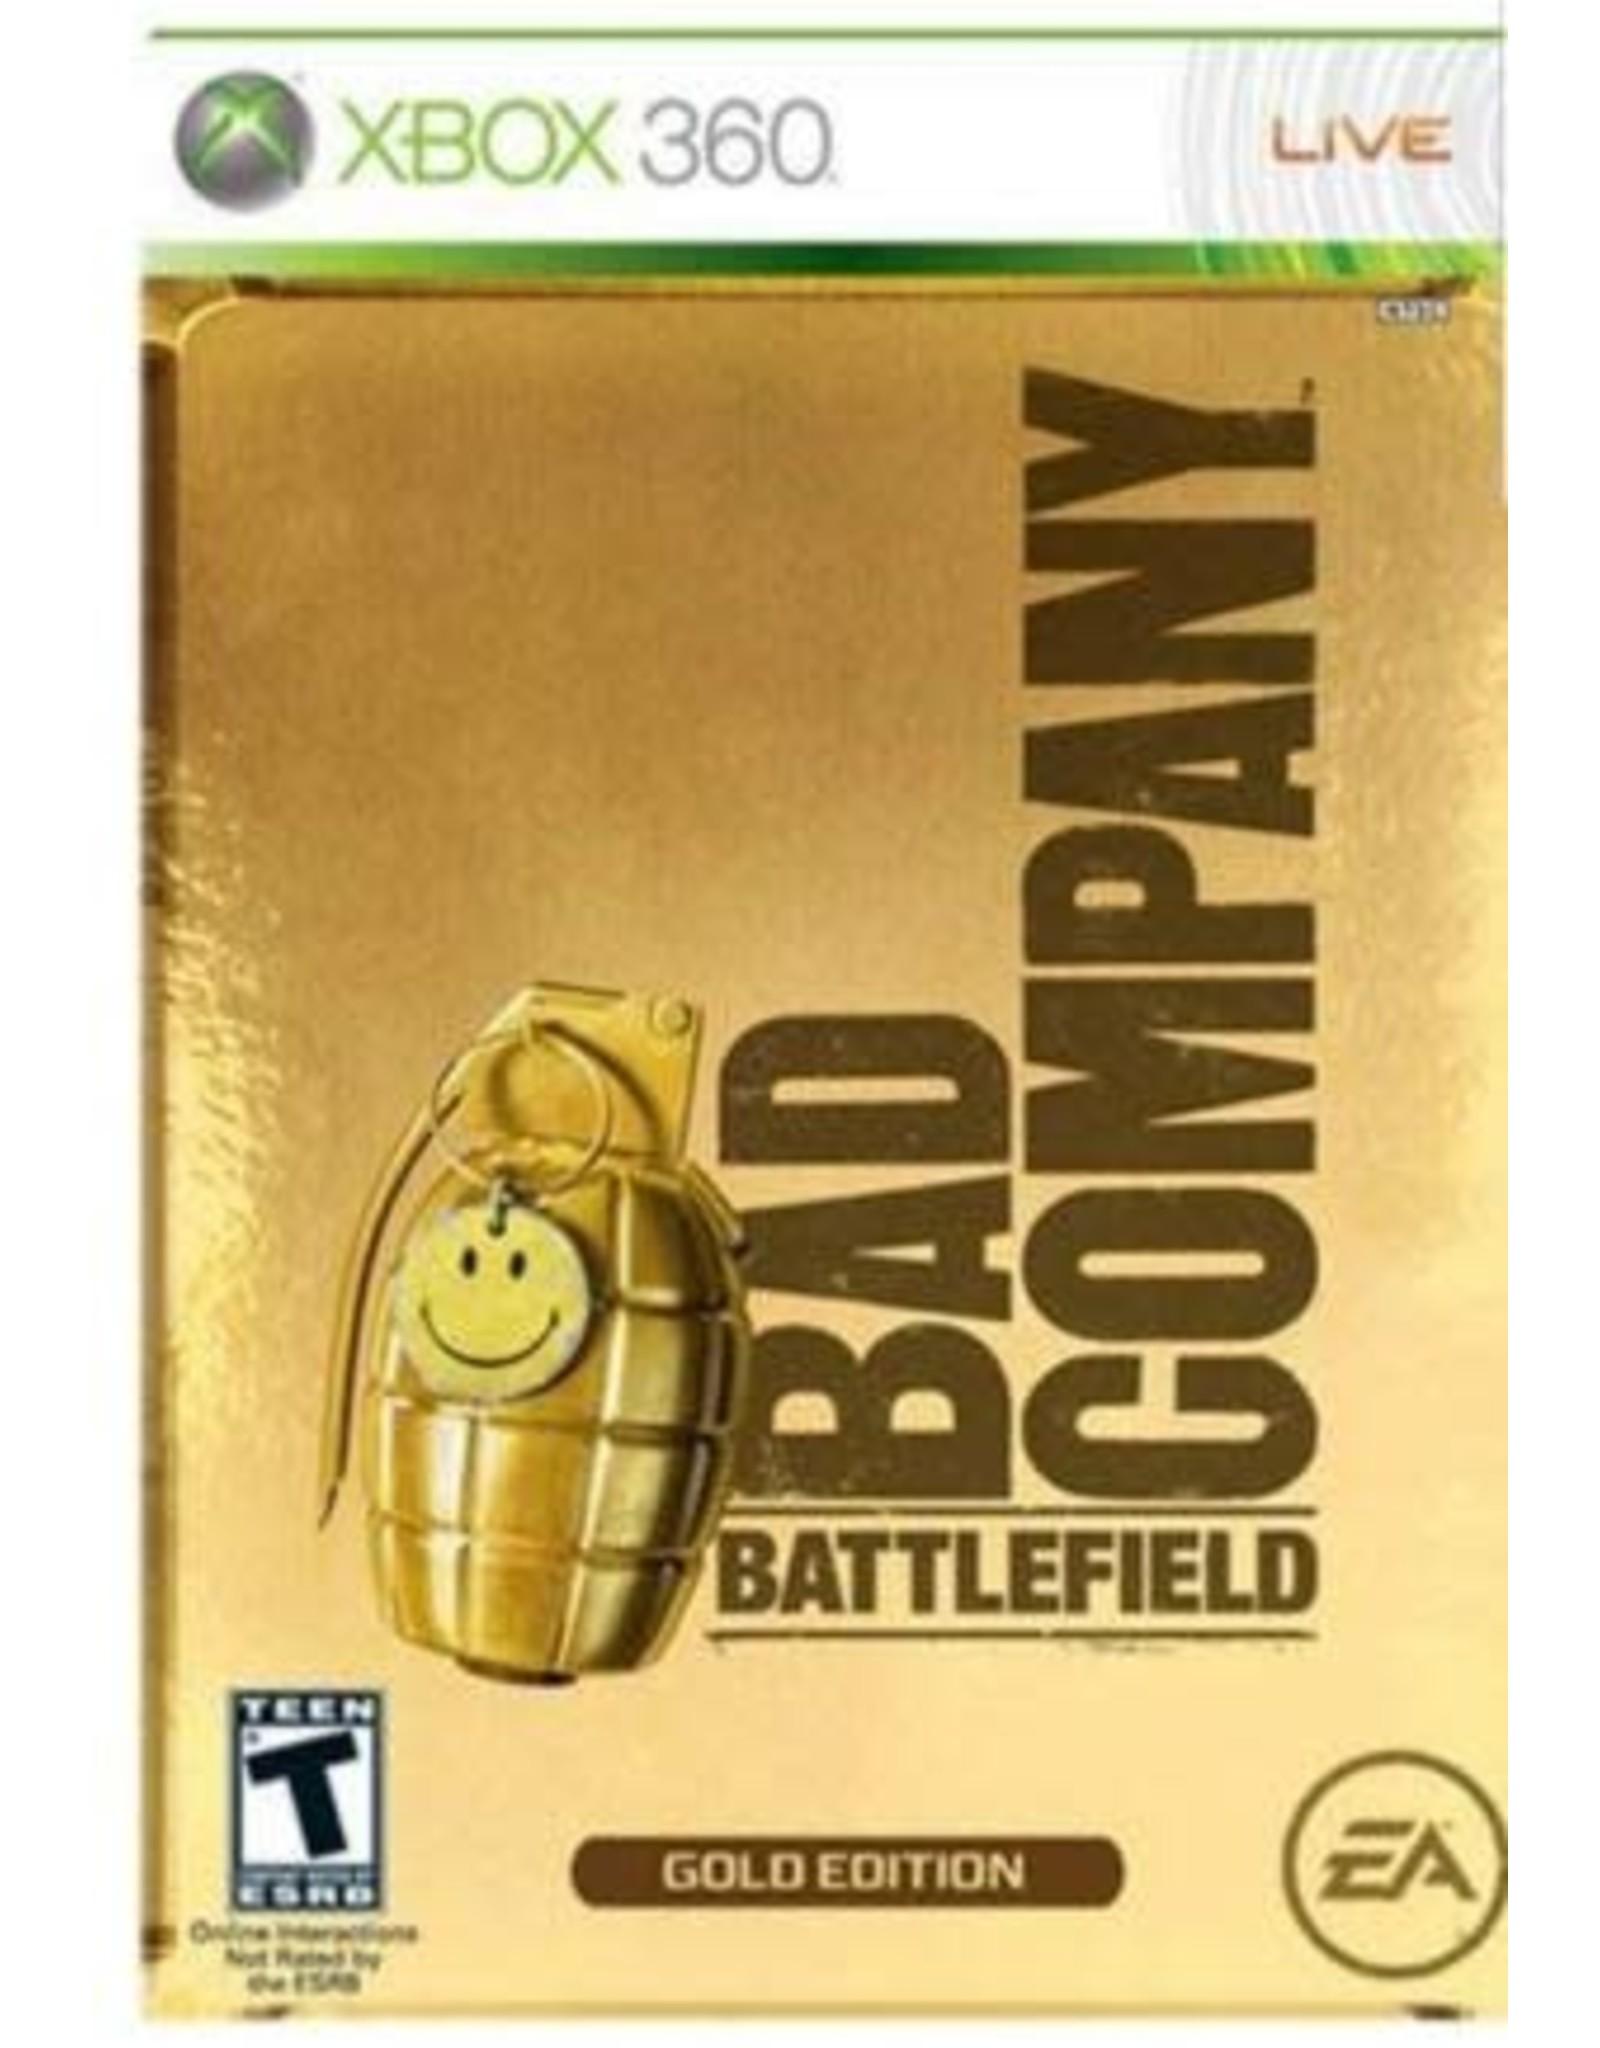 Xbox 360 Battlefield Bad Company Gold Edition